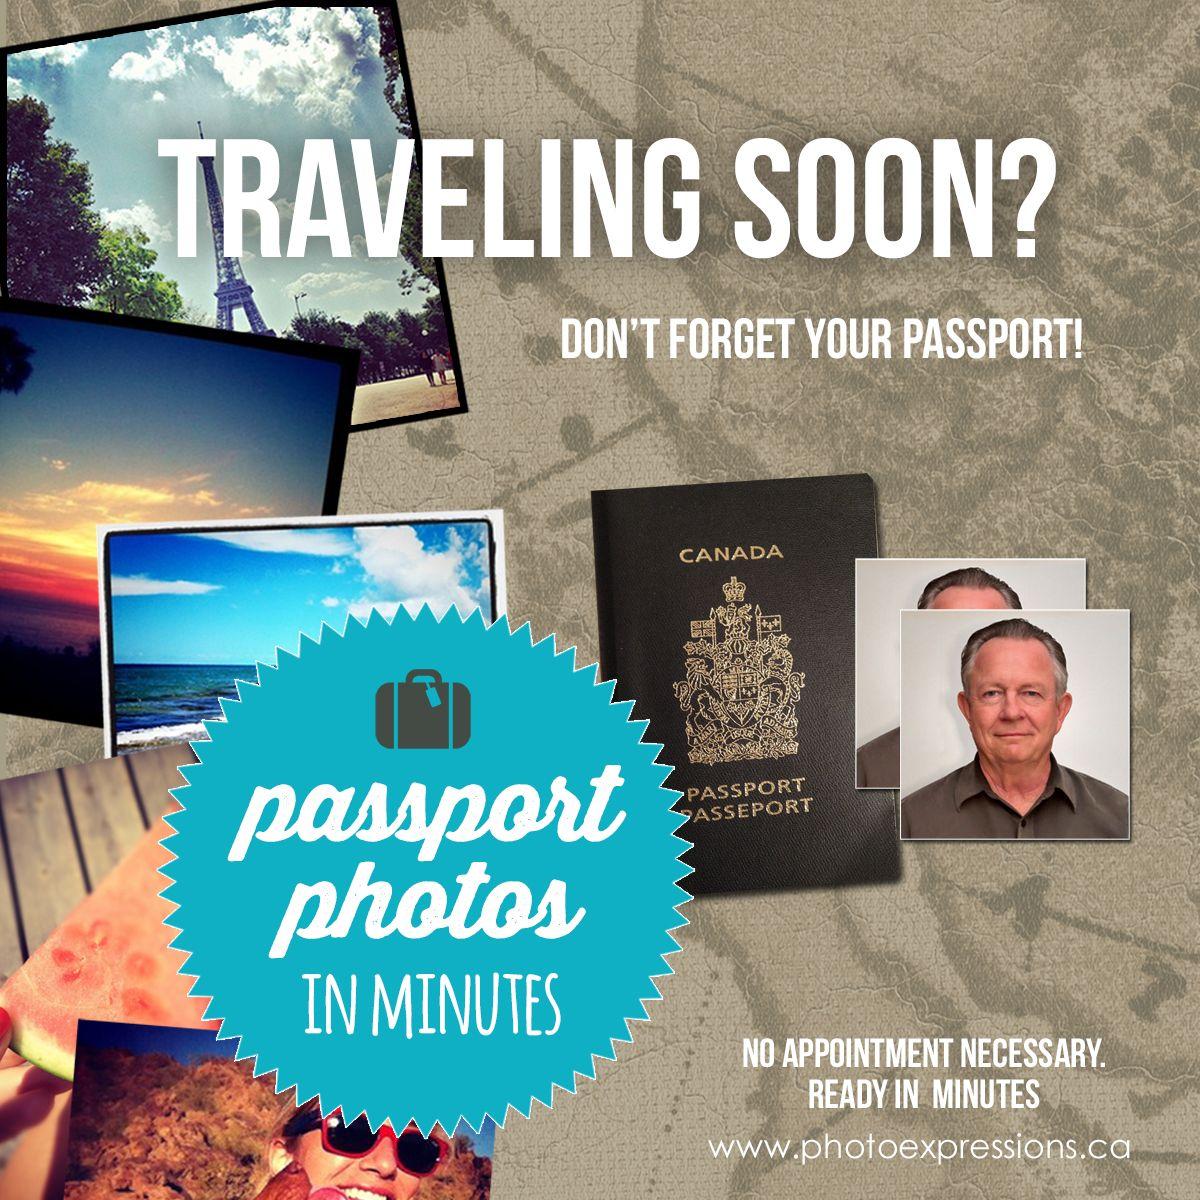 Is your passport expiring? Update your passport photo at